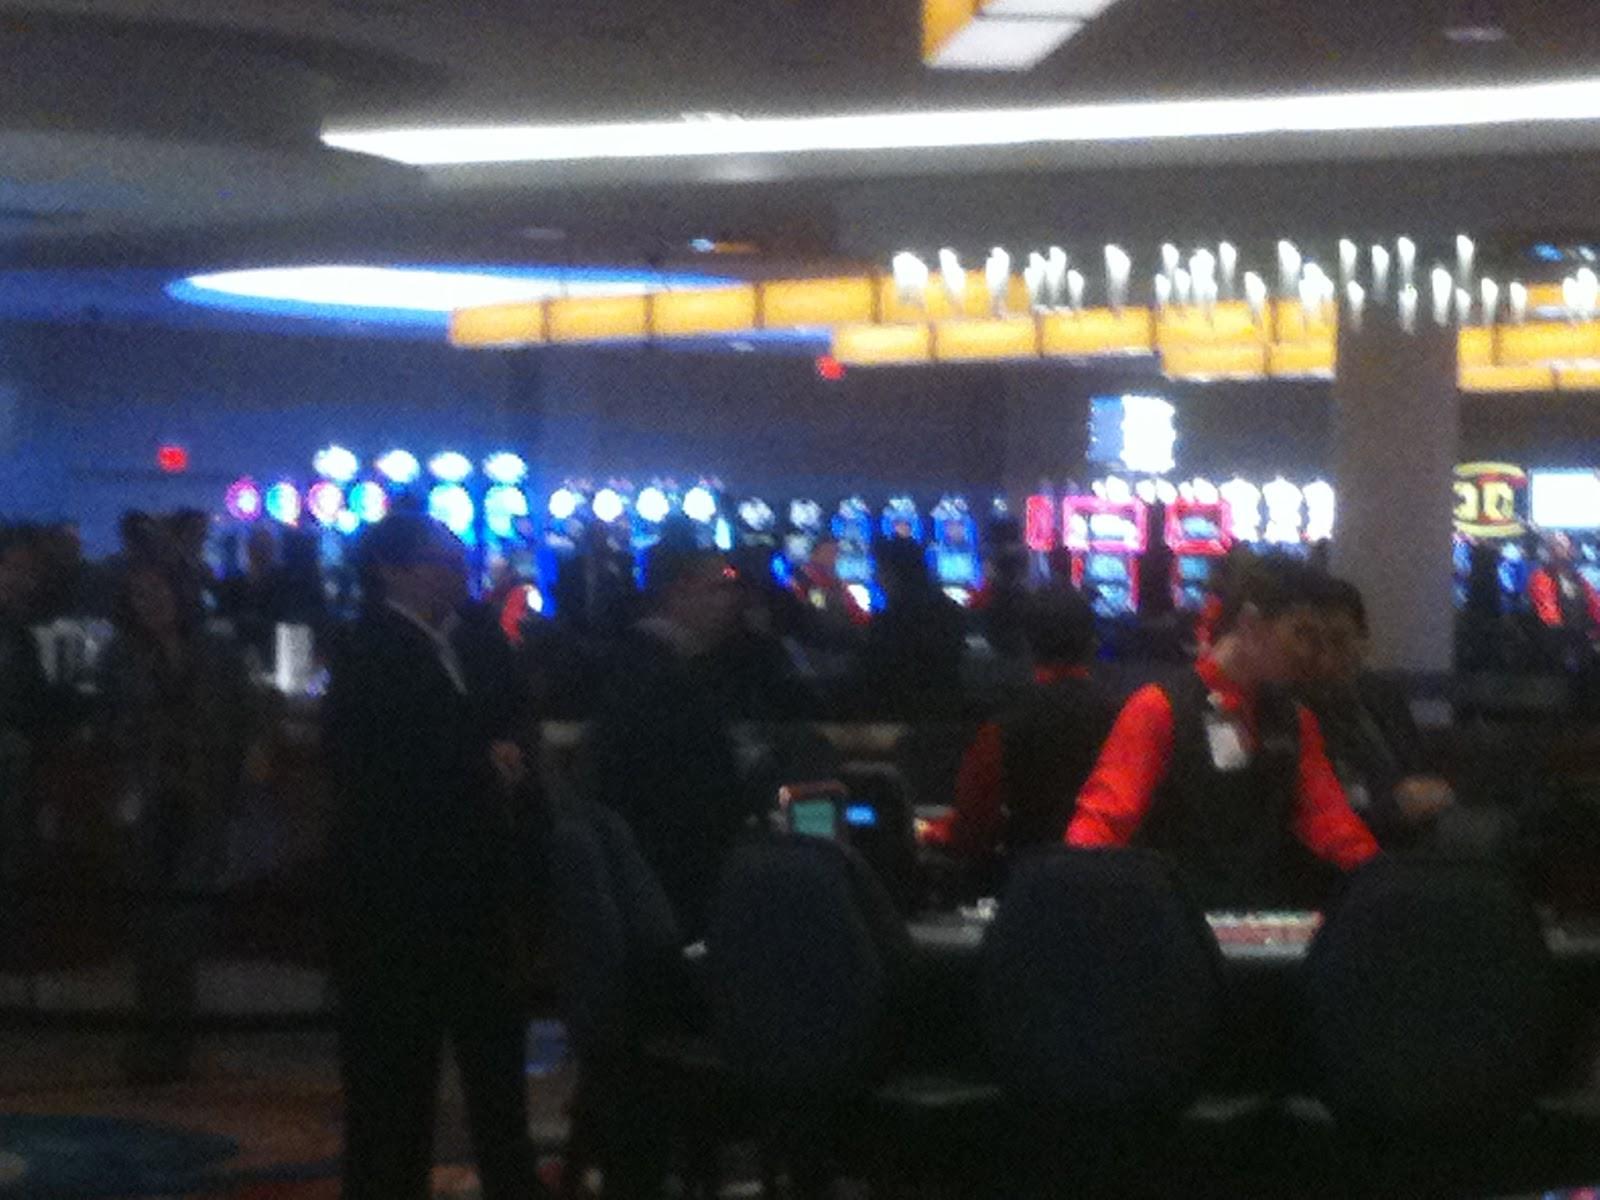 Vf casino resort